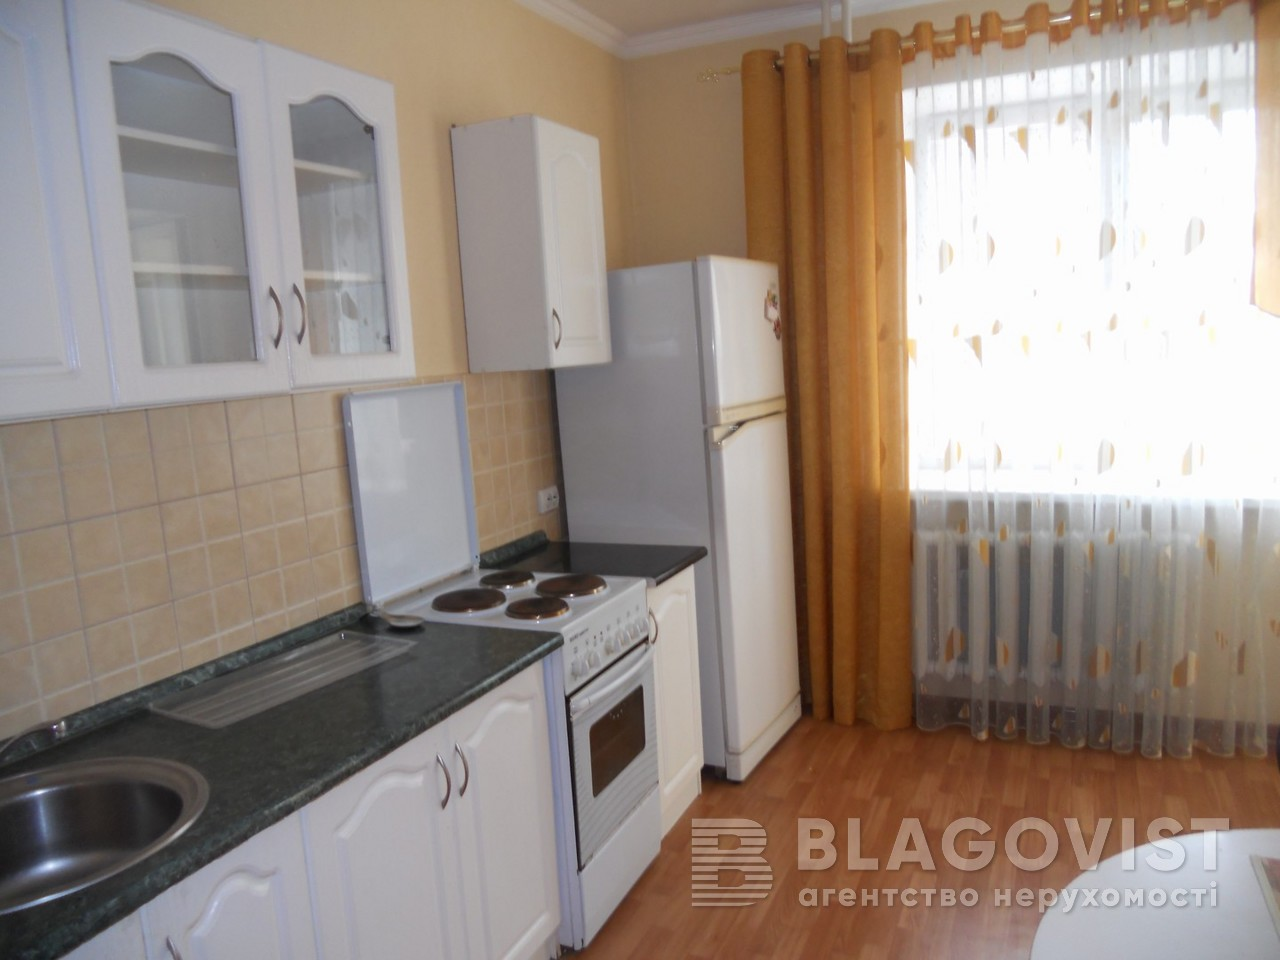 Квартира E-7318, Вишняківська, 13, Київ - Фото 12